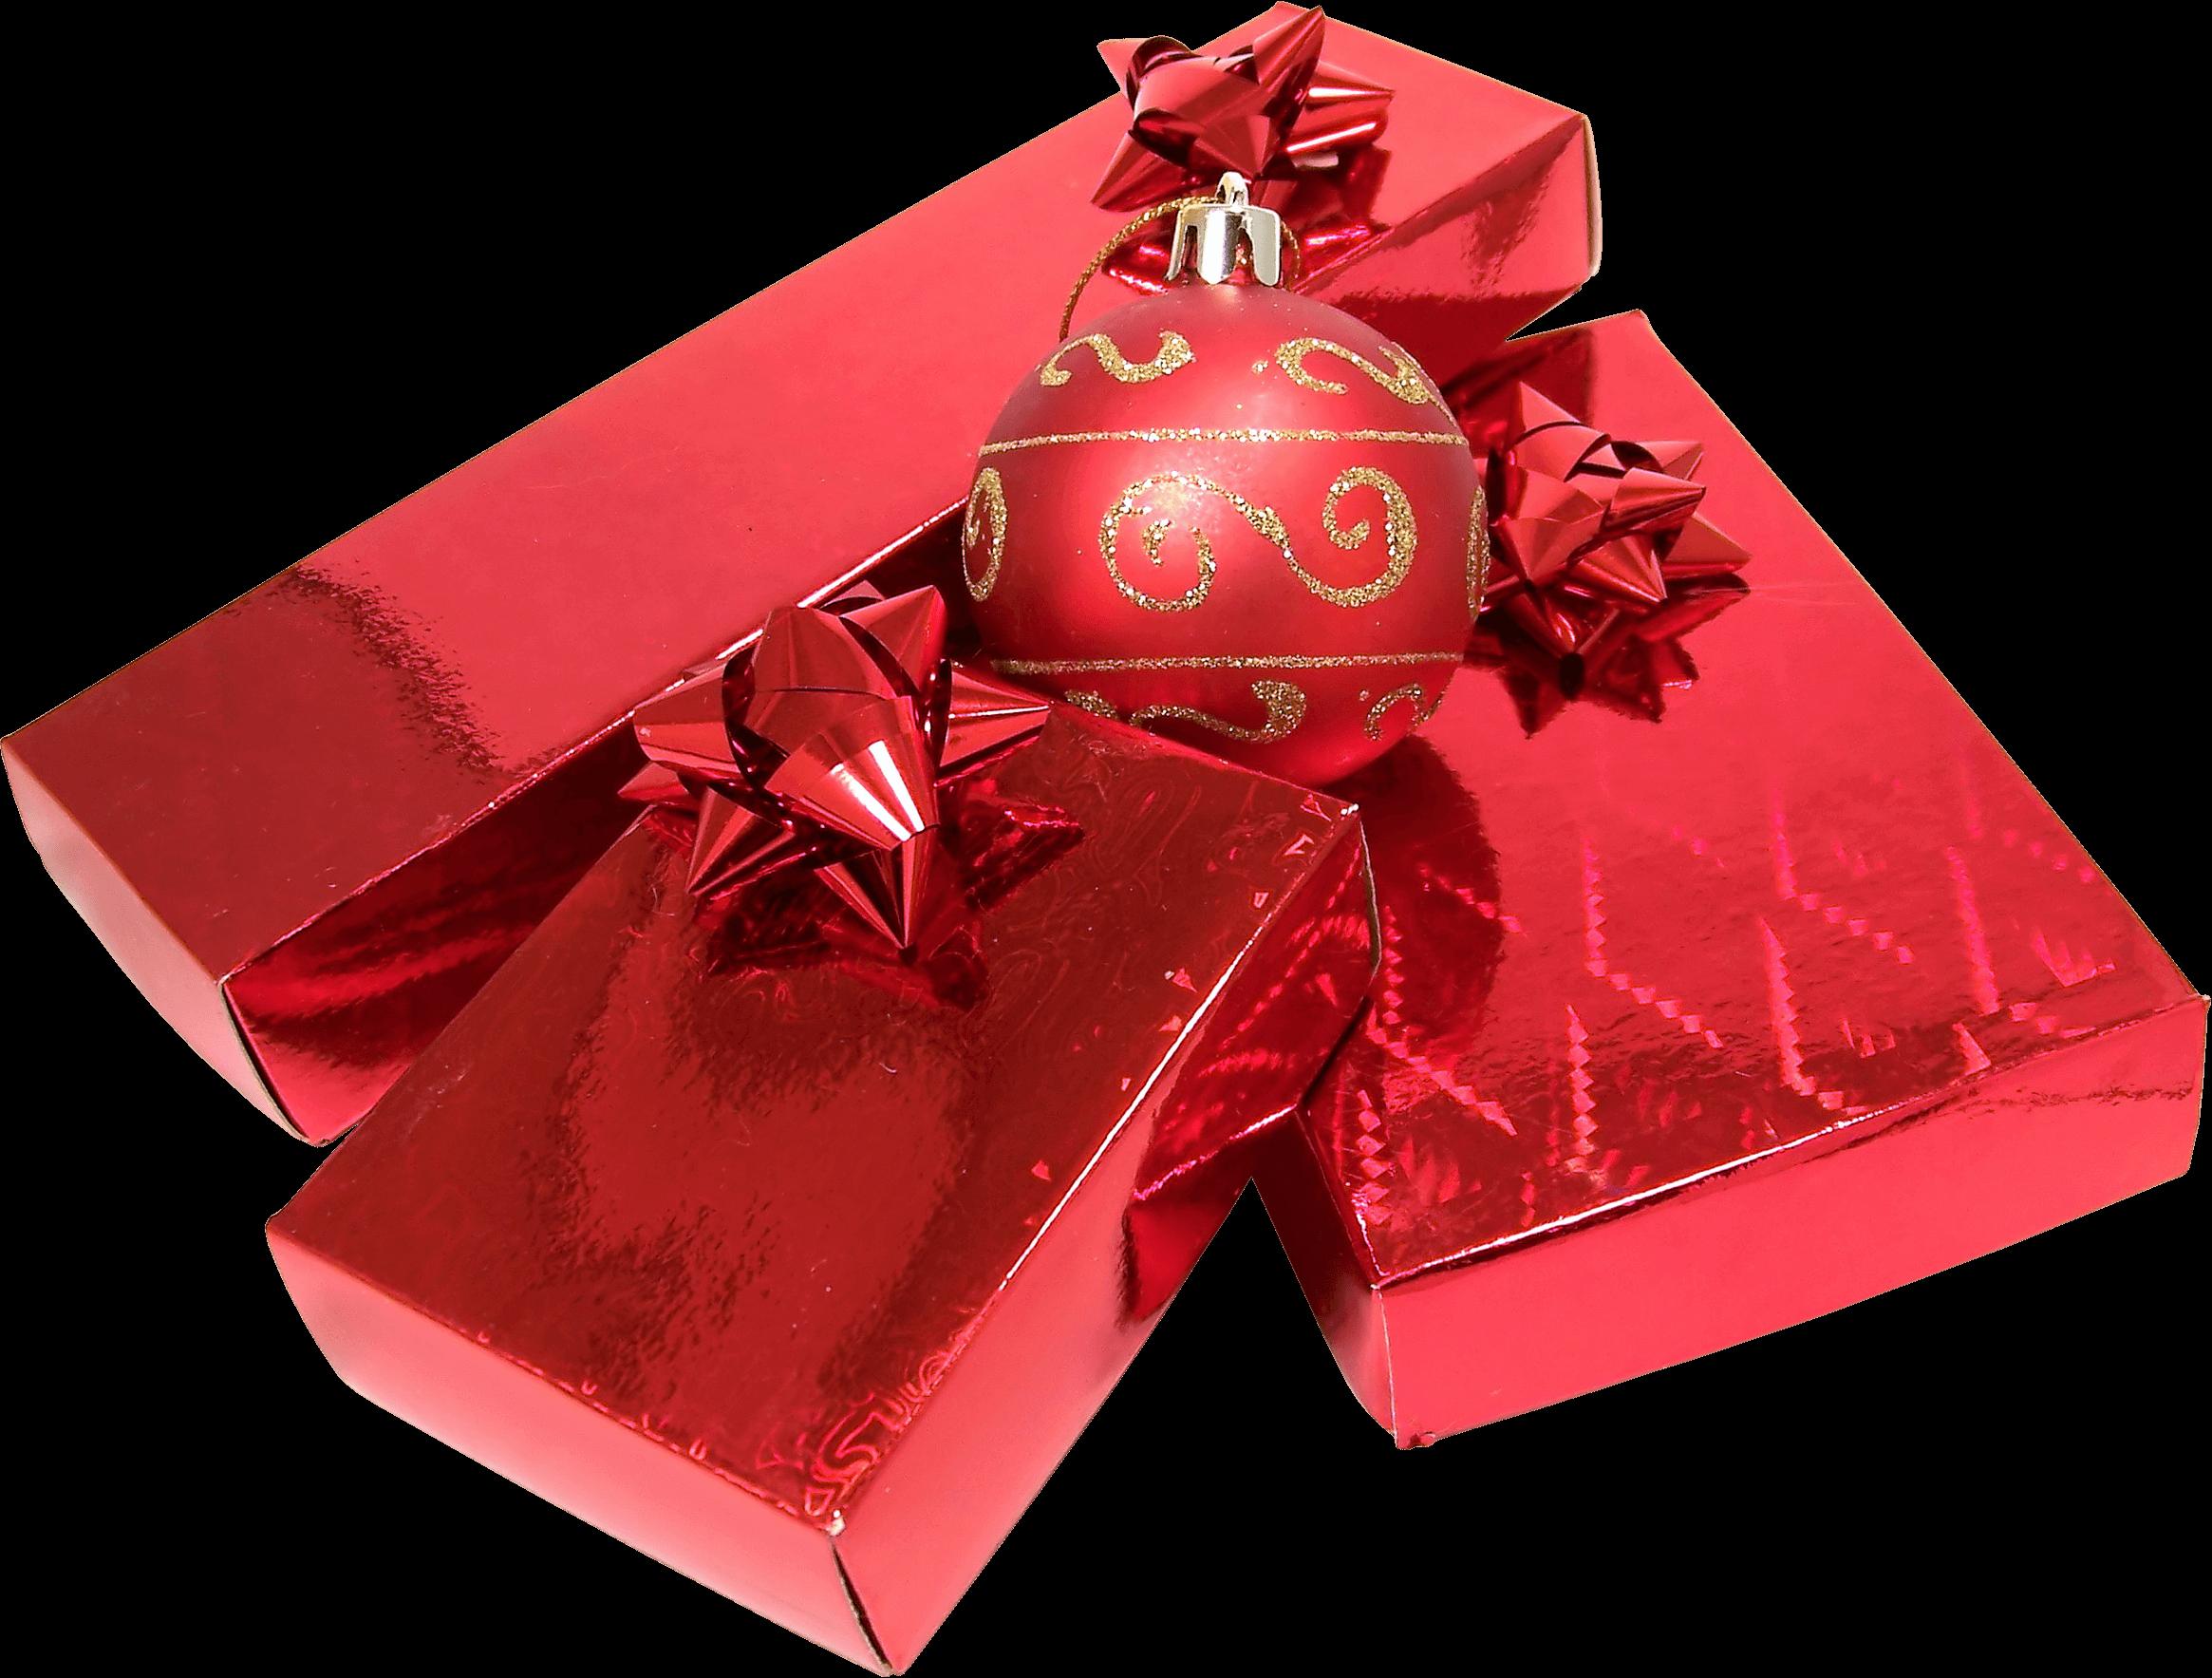 Gifts Christmas Png Image